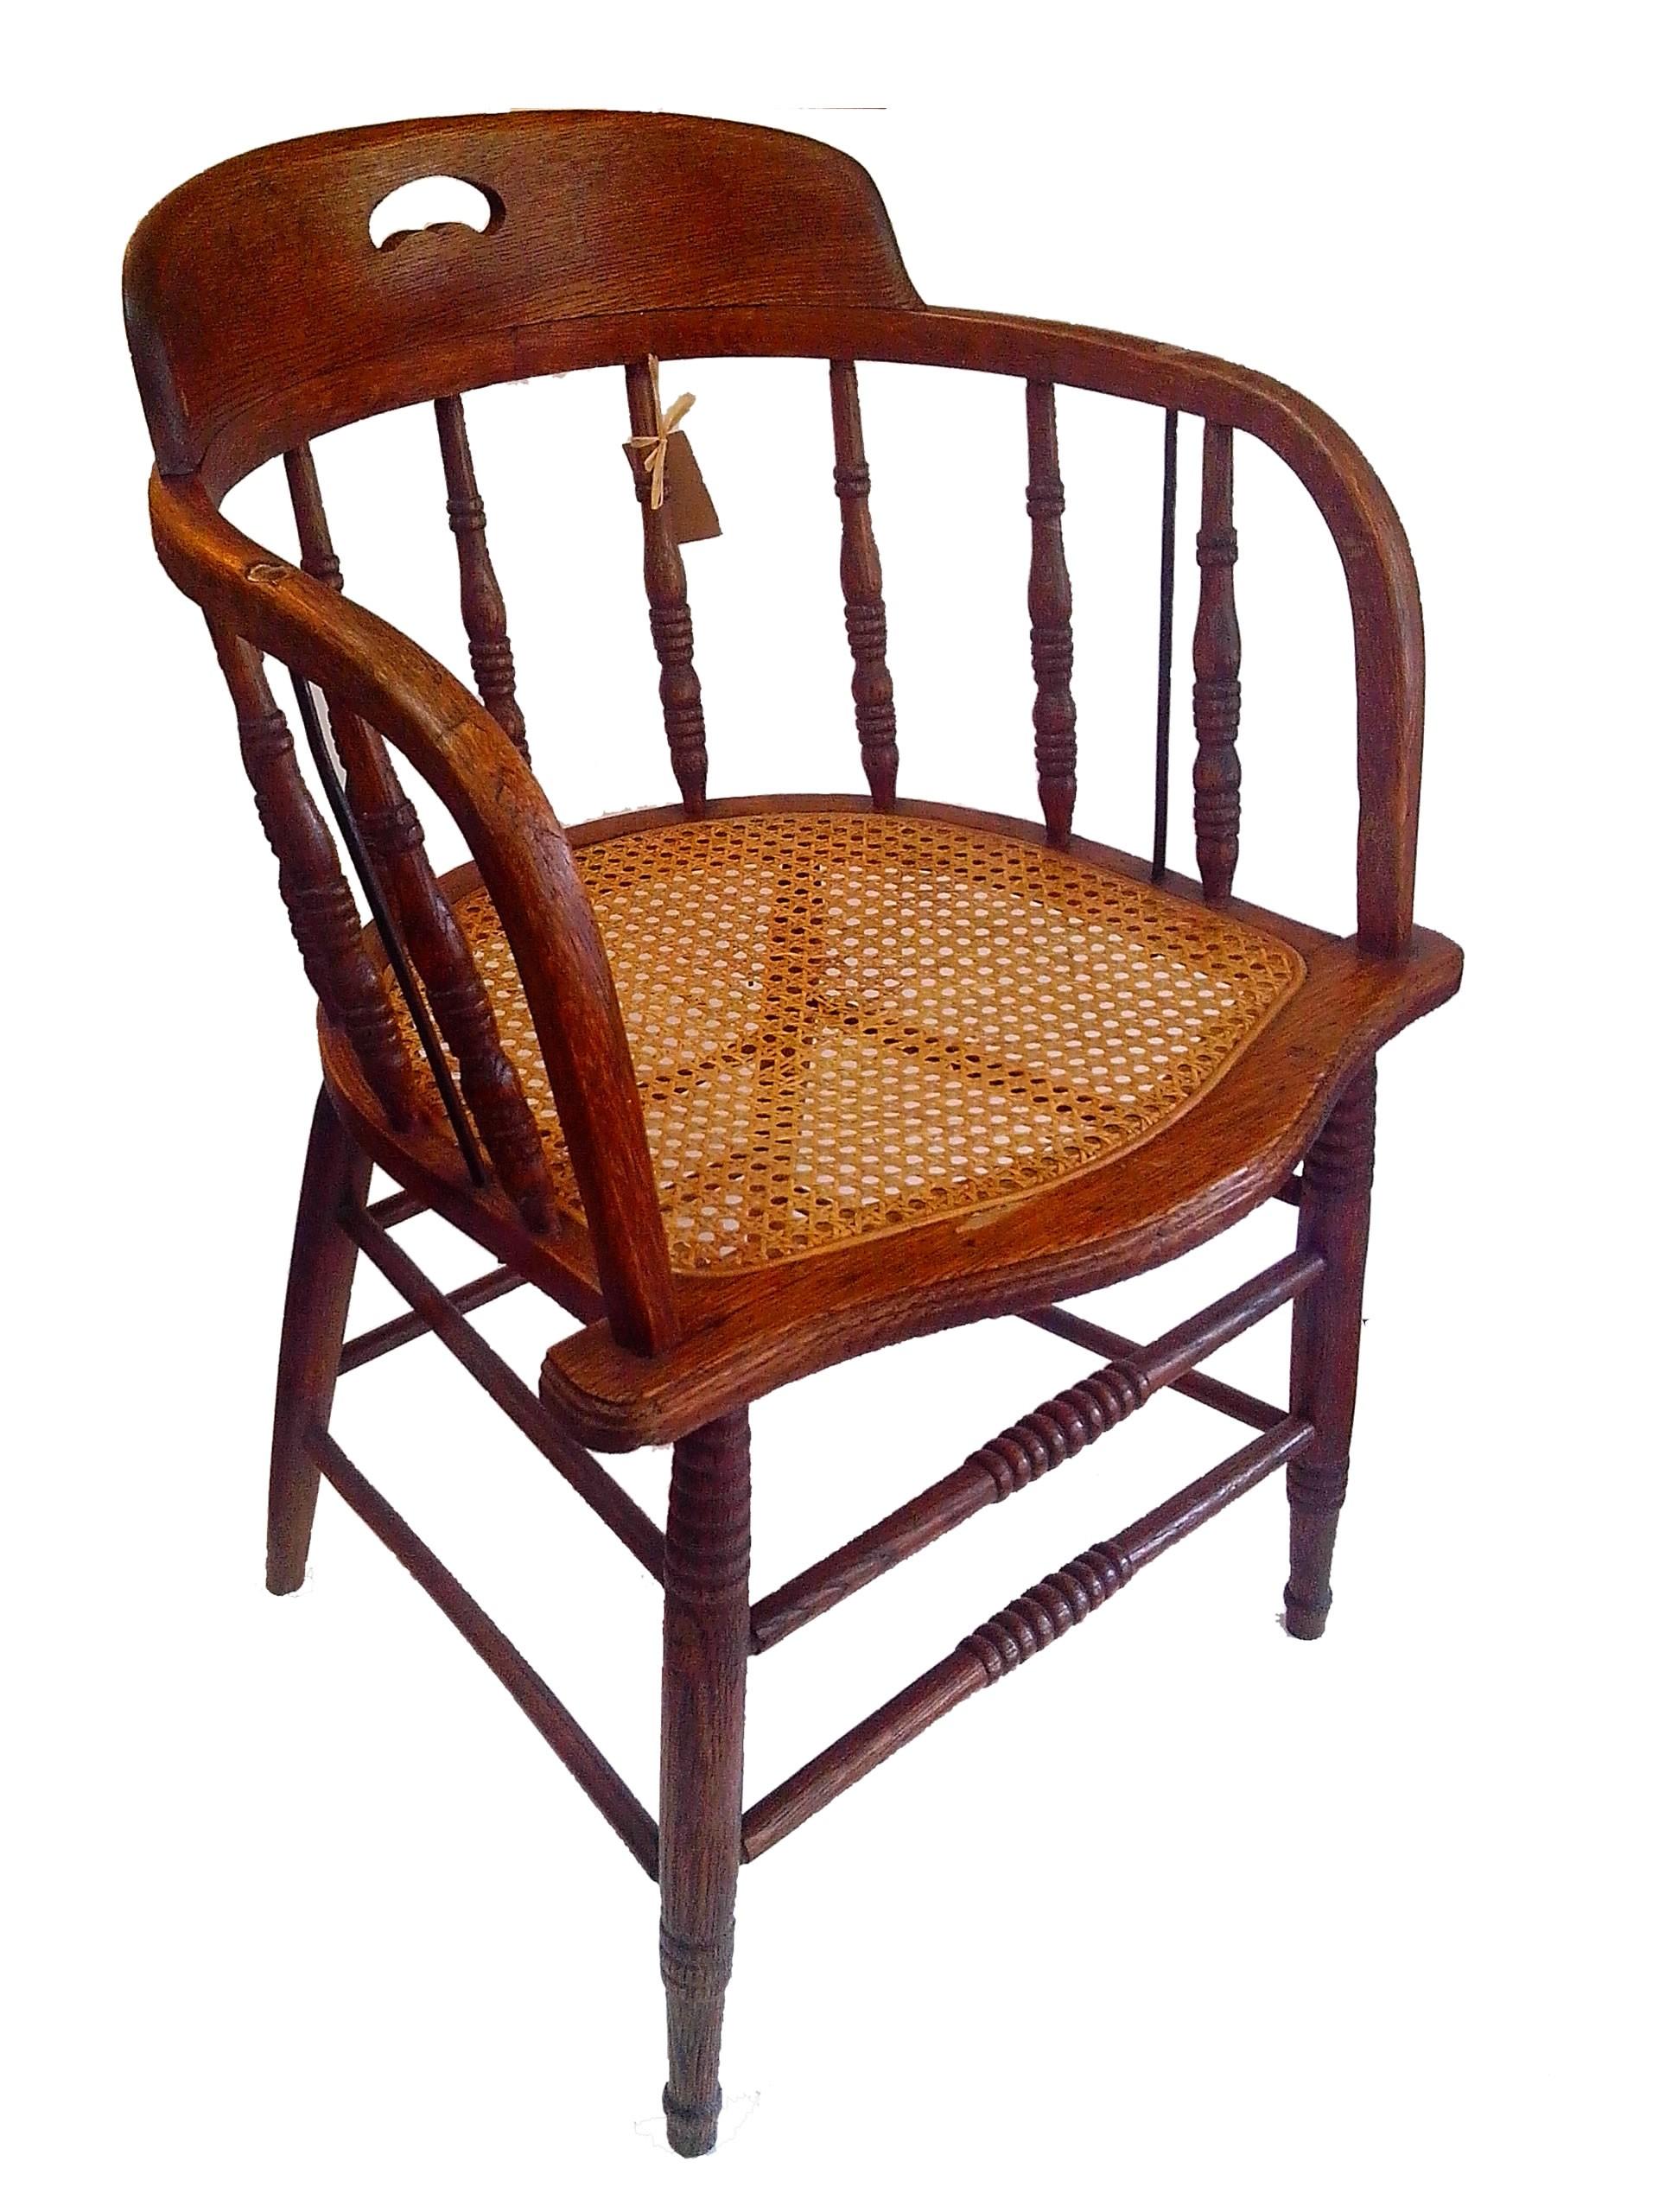 Captain's Chair - New Zealand Vintage Collectibles, Antiques & retro PLXYRIR